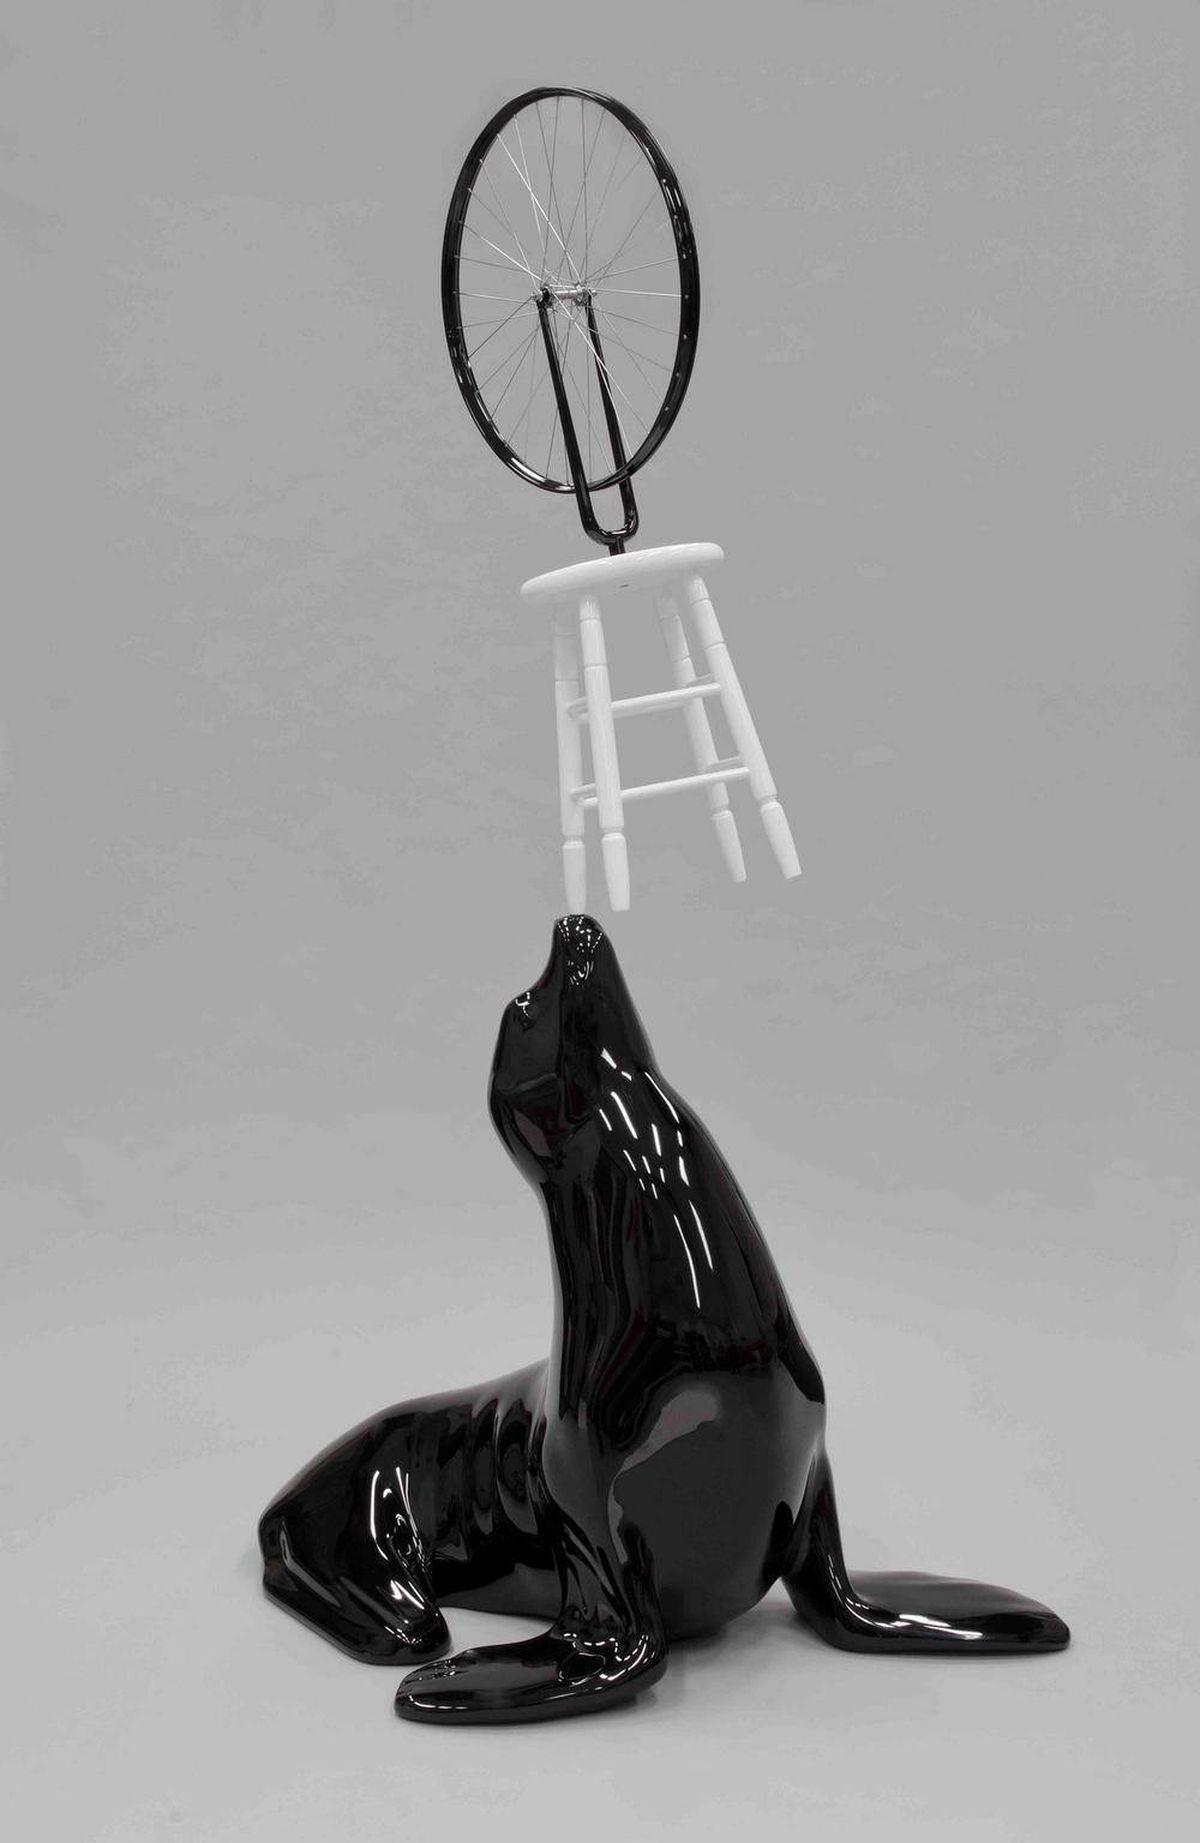 Michael Parekowhai, My Sister, My Self, 2007. Fibreglass, wood and enamel paint (ed. 3/5), National Gallery of Canada, Ottawa ©